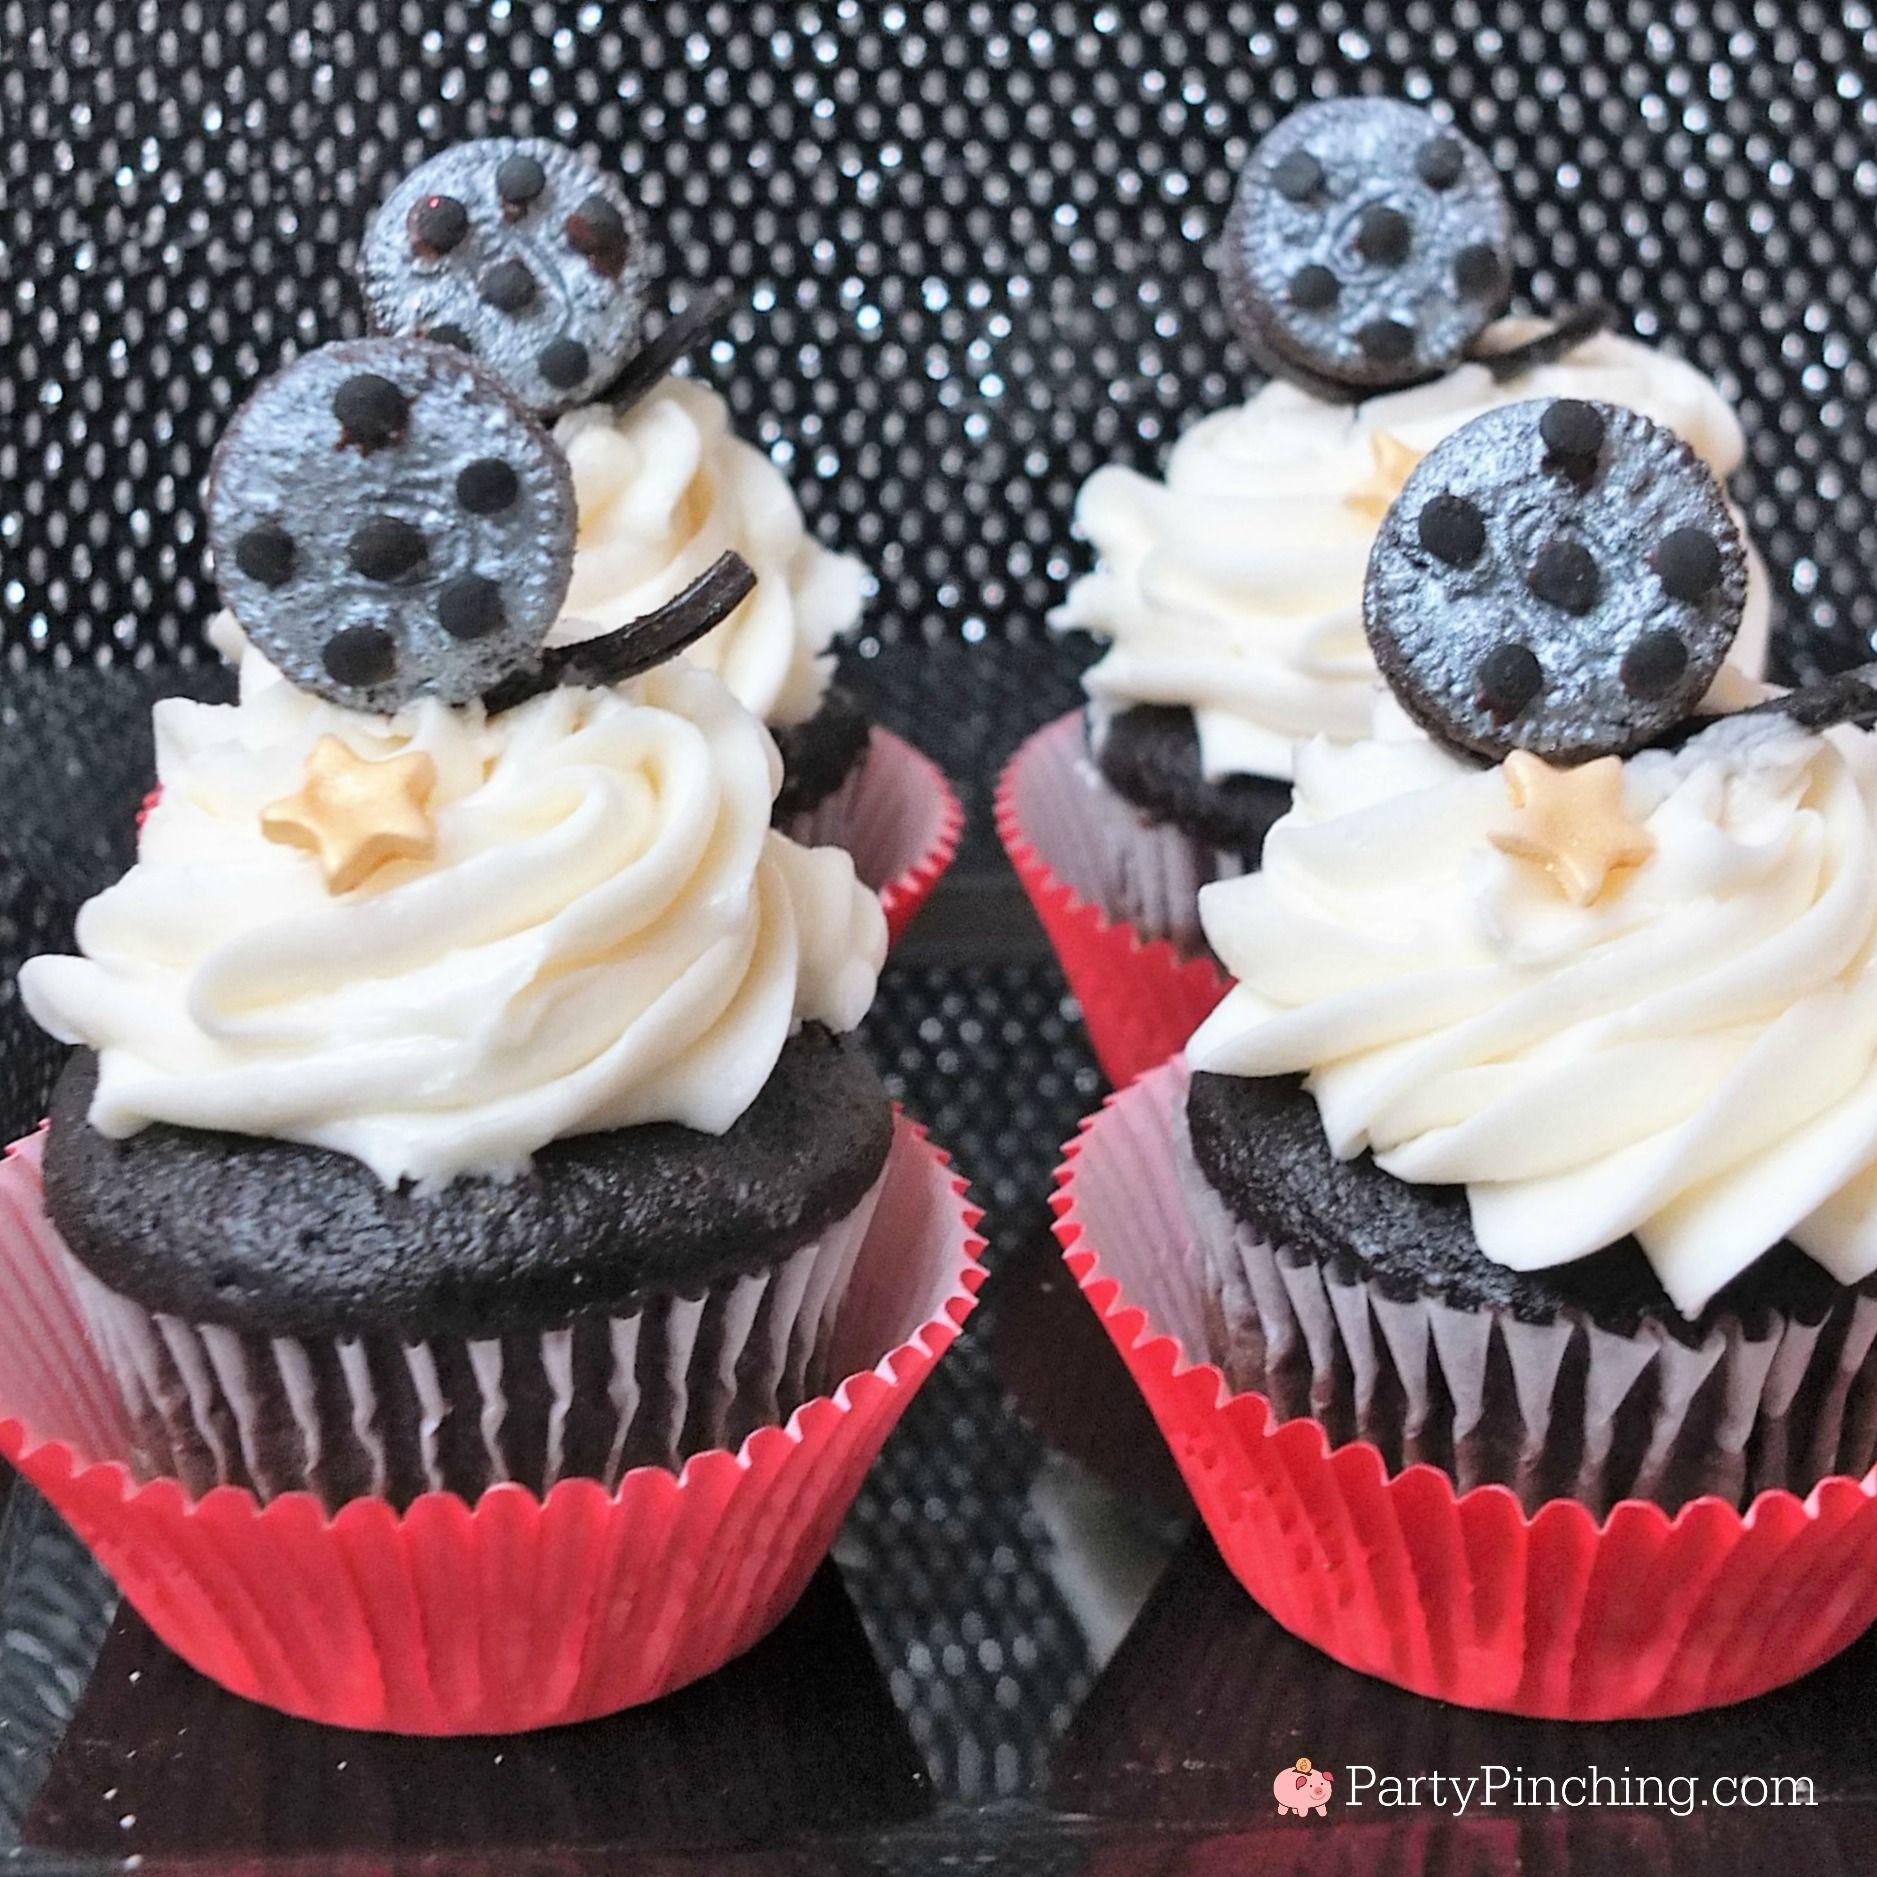 Movie cupcakes, movie night food recipes, Oscar Academy award party #academyaward